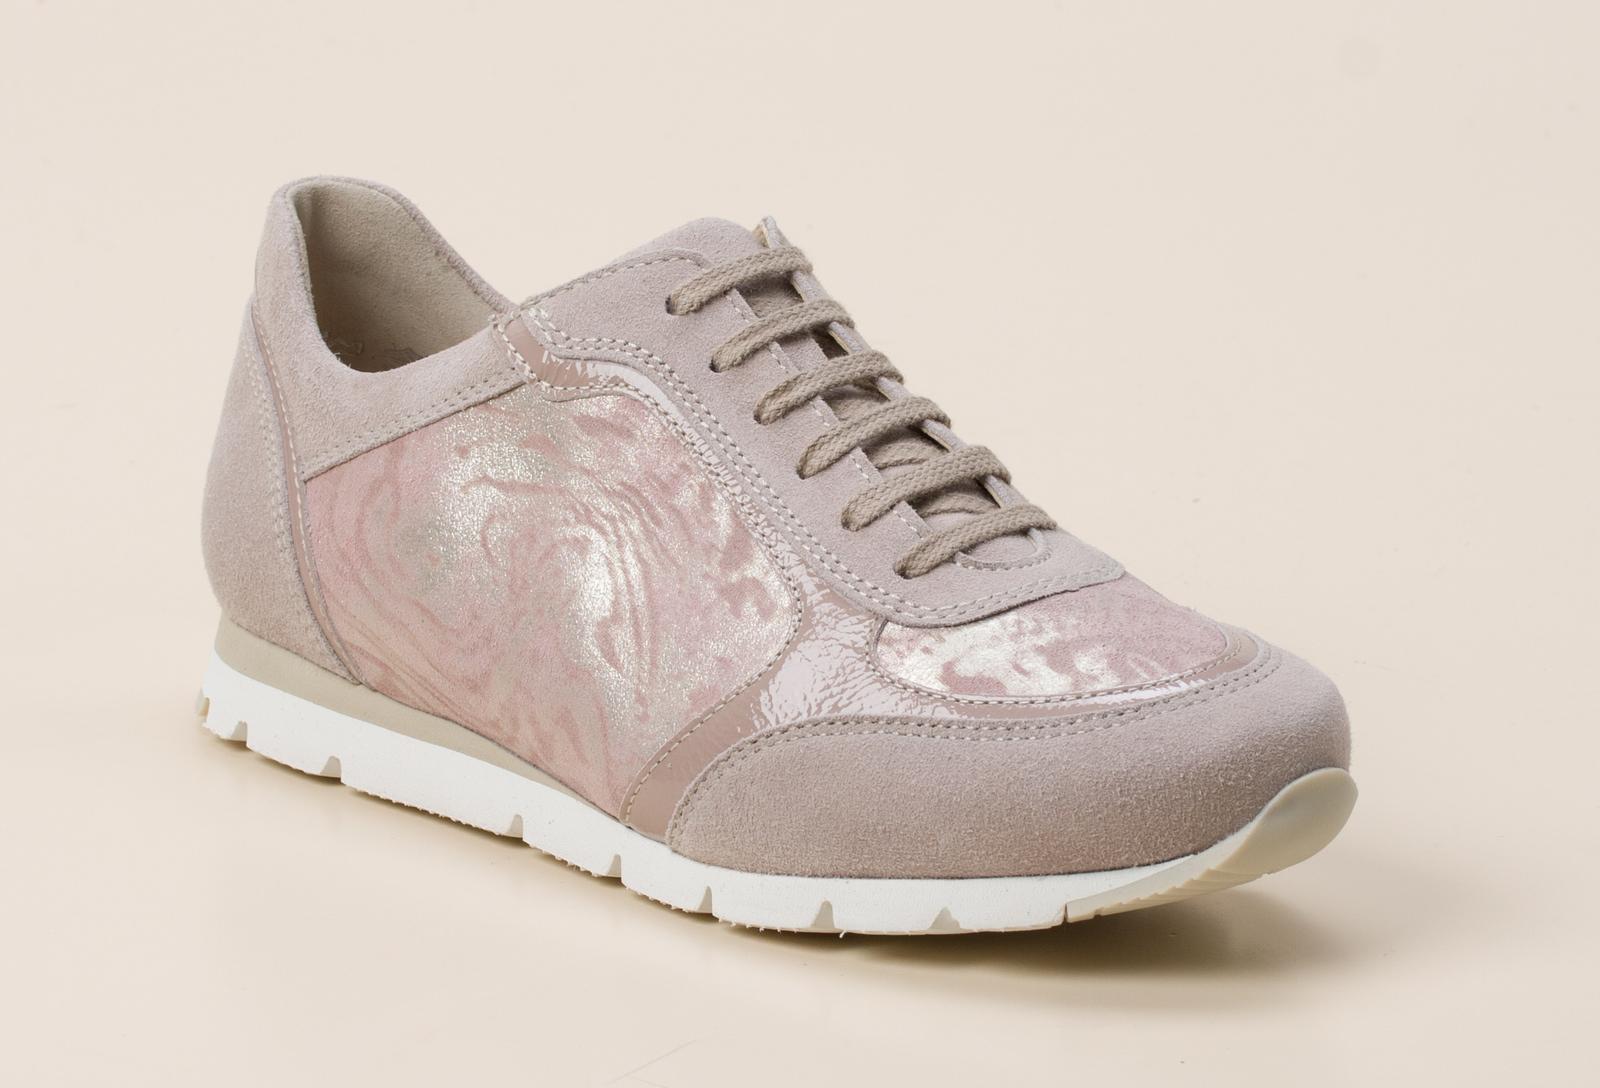 Semler Damen Sneaker in Pink kaufen   Zumnorde Online-Shop 622c67f69f